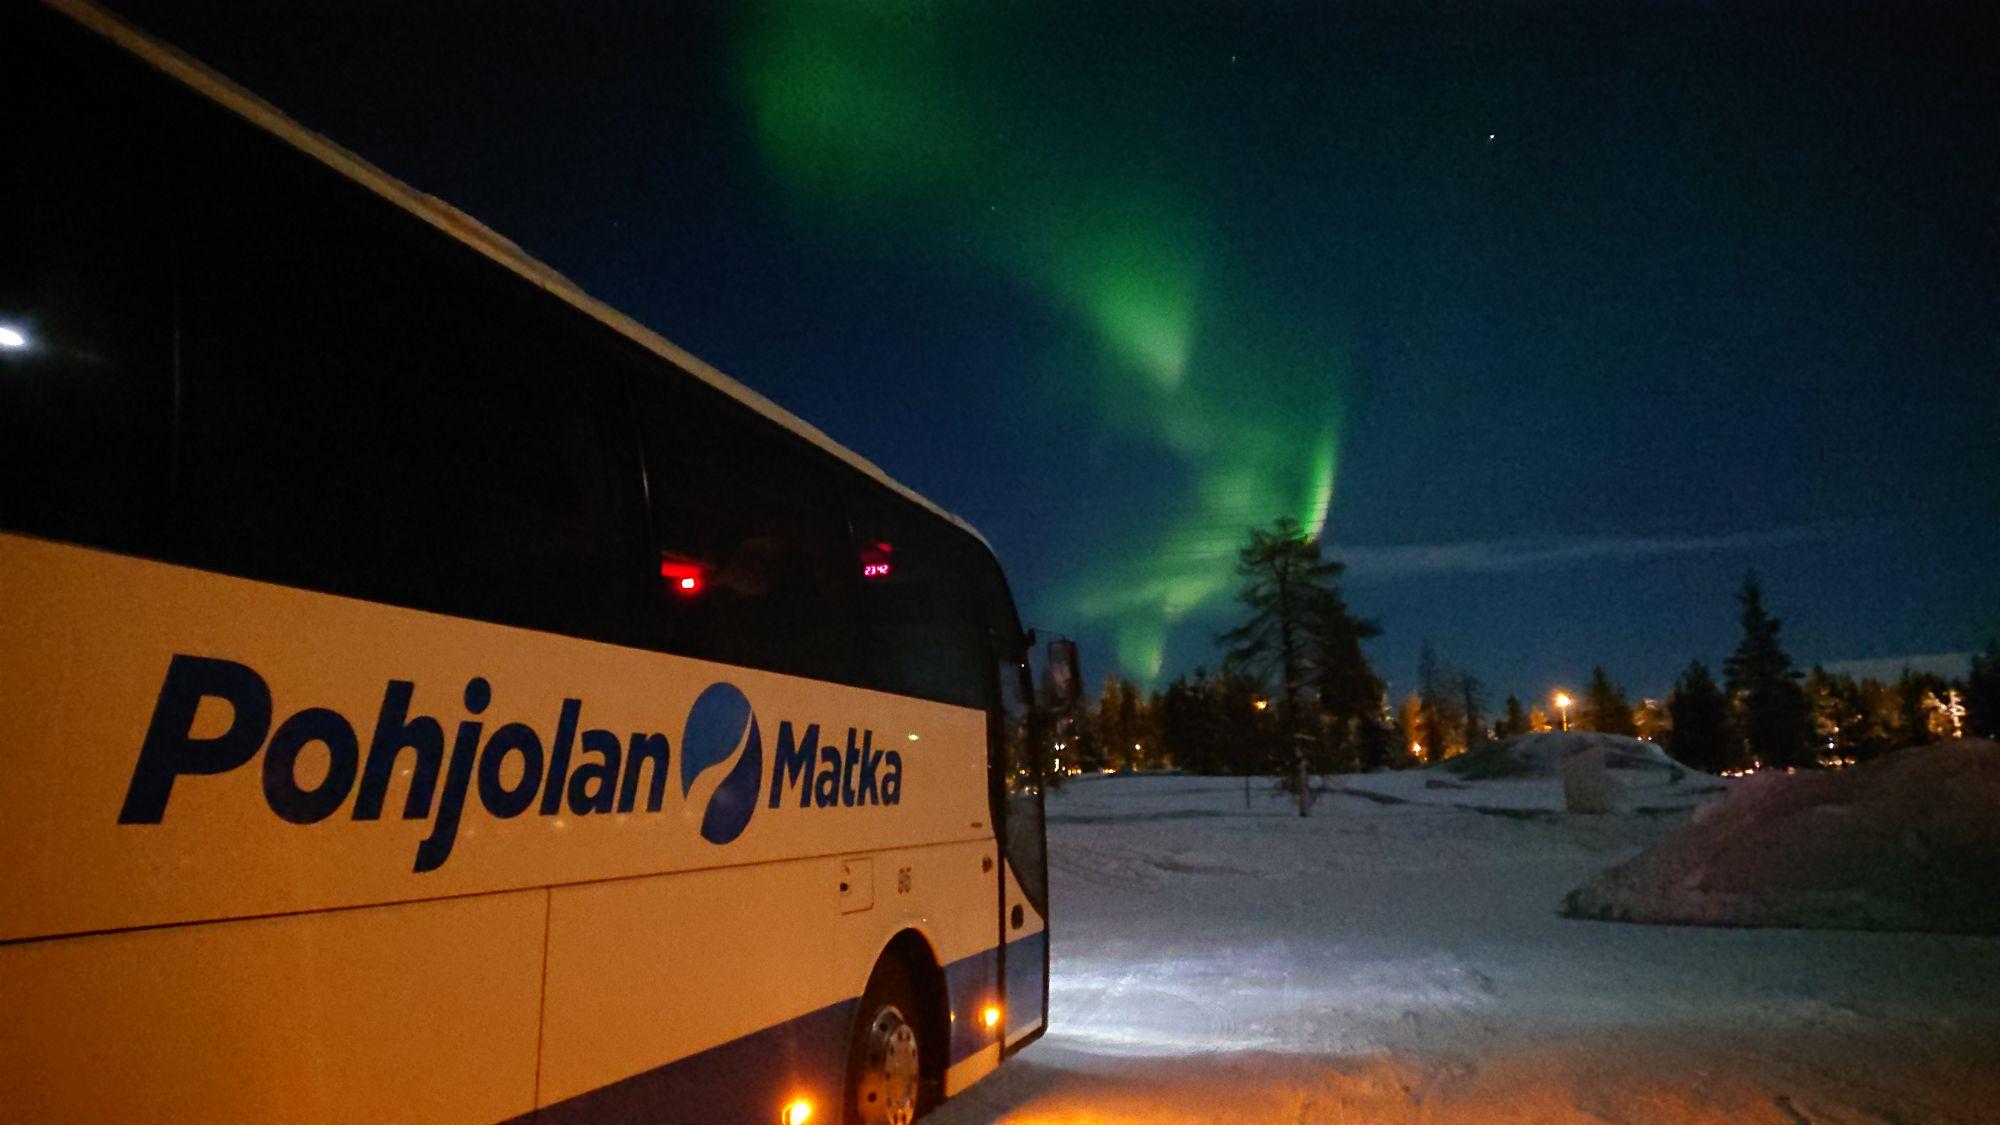 Pohjolan matka bussikuva revontulet